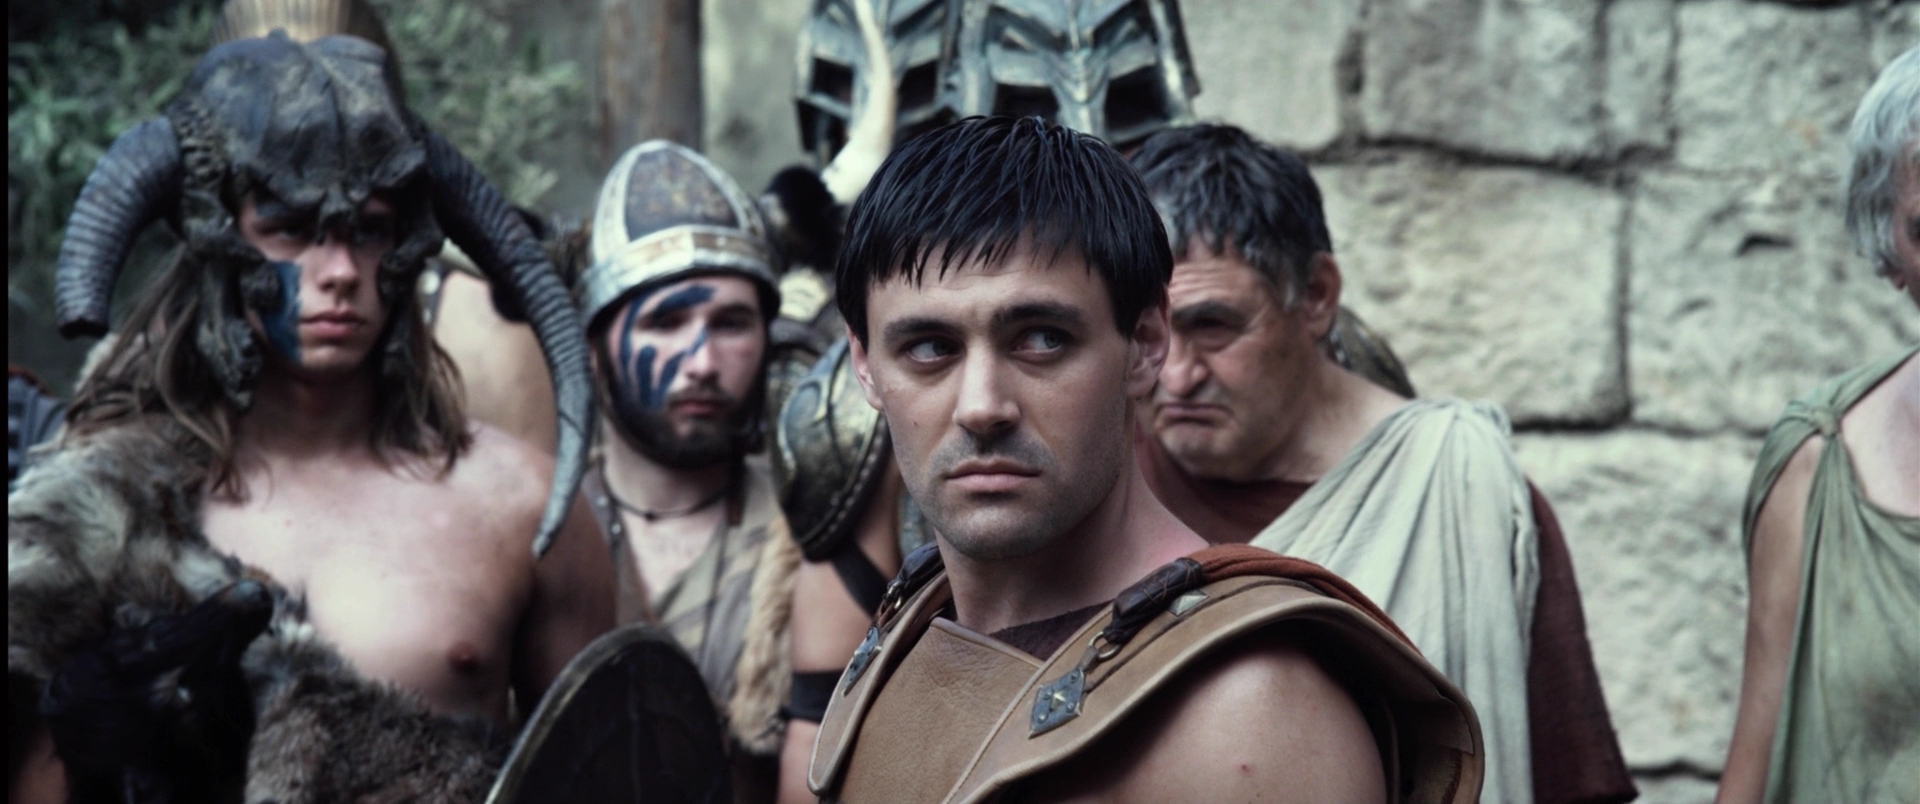 Геракл: Начало легенды / The Legend of Hercules (2014) BDRip 1080p | Лицензия